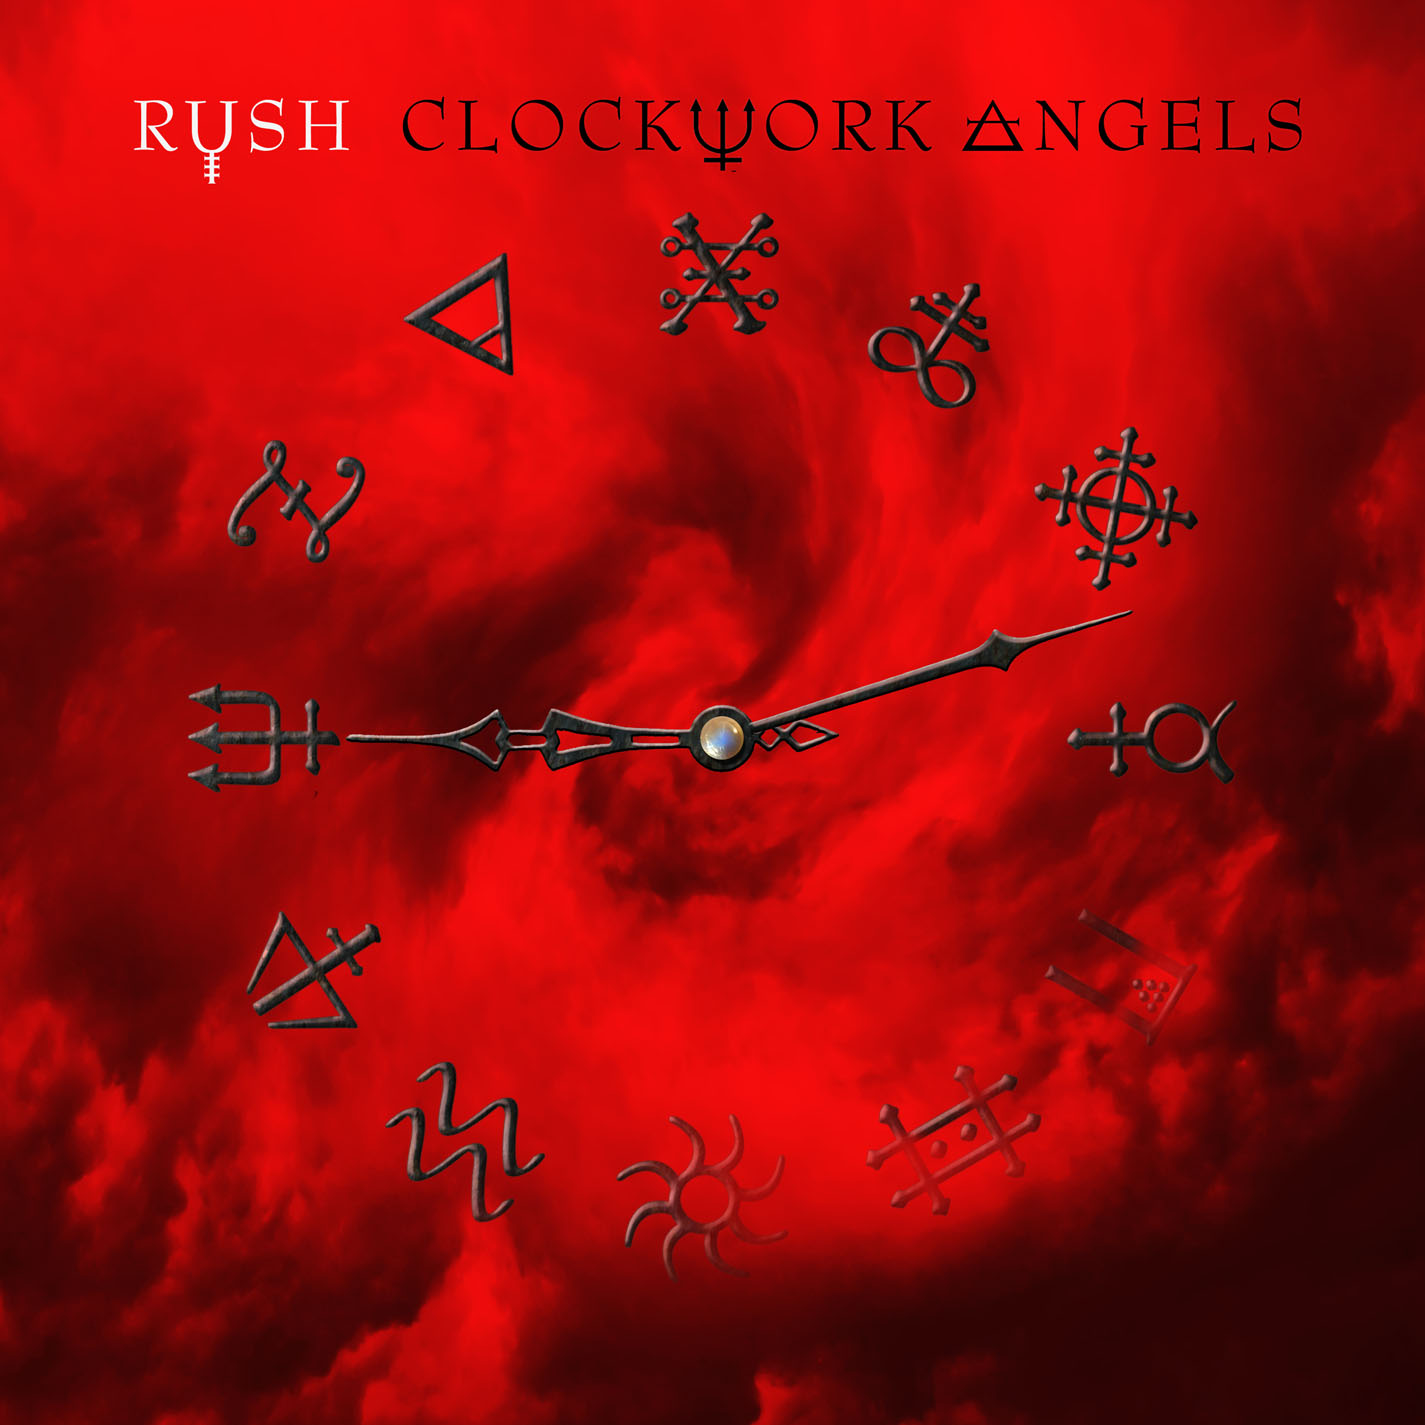 Rush en grande forme avec Clockwork Angels !